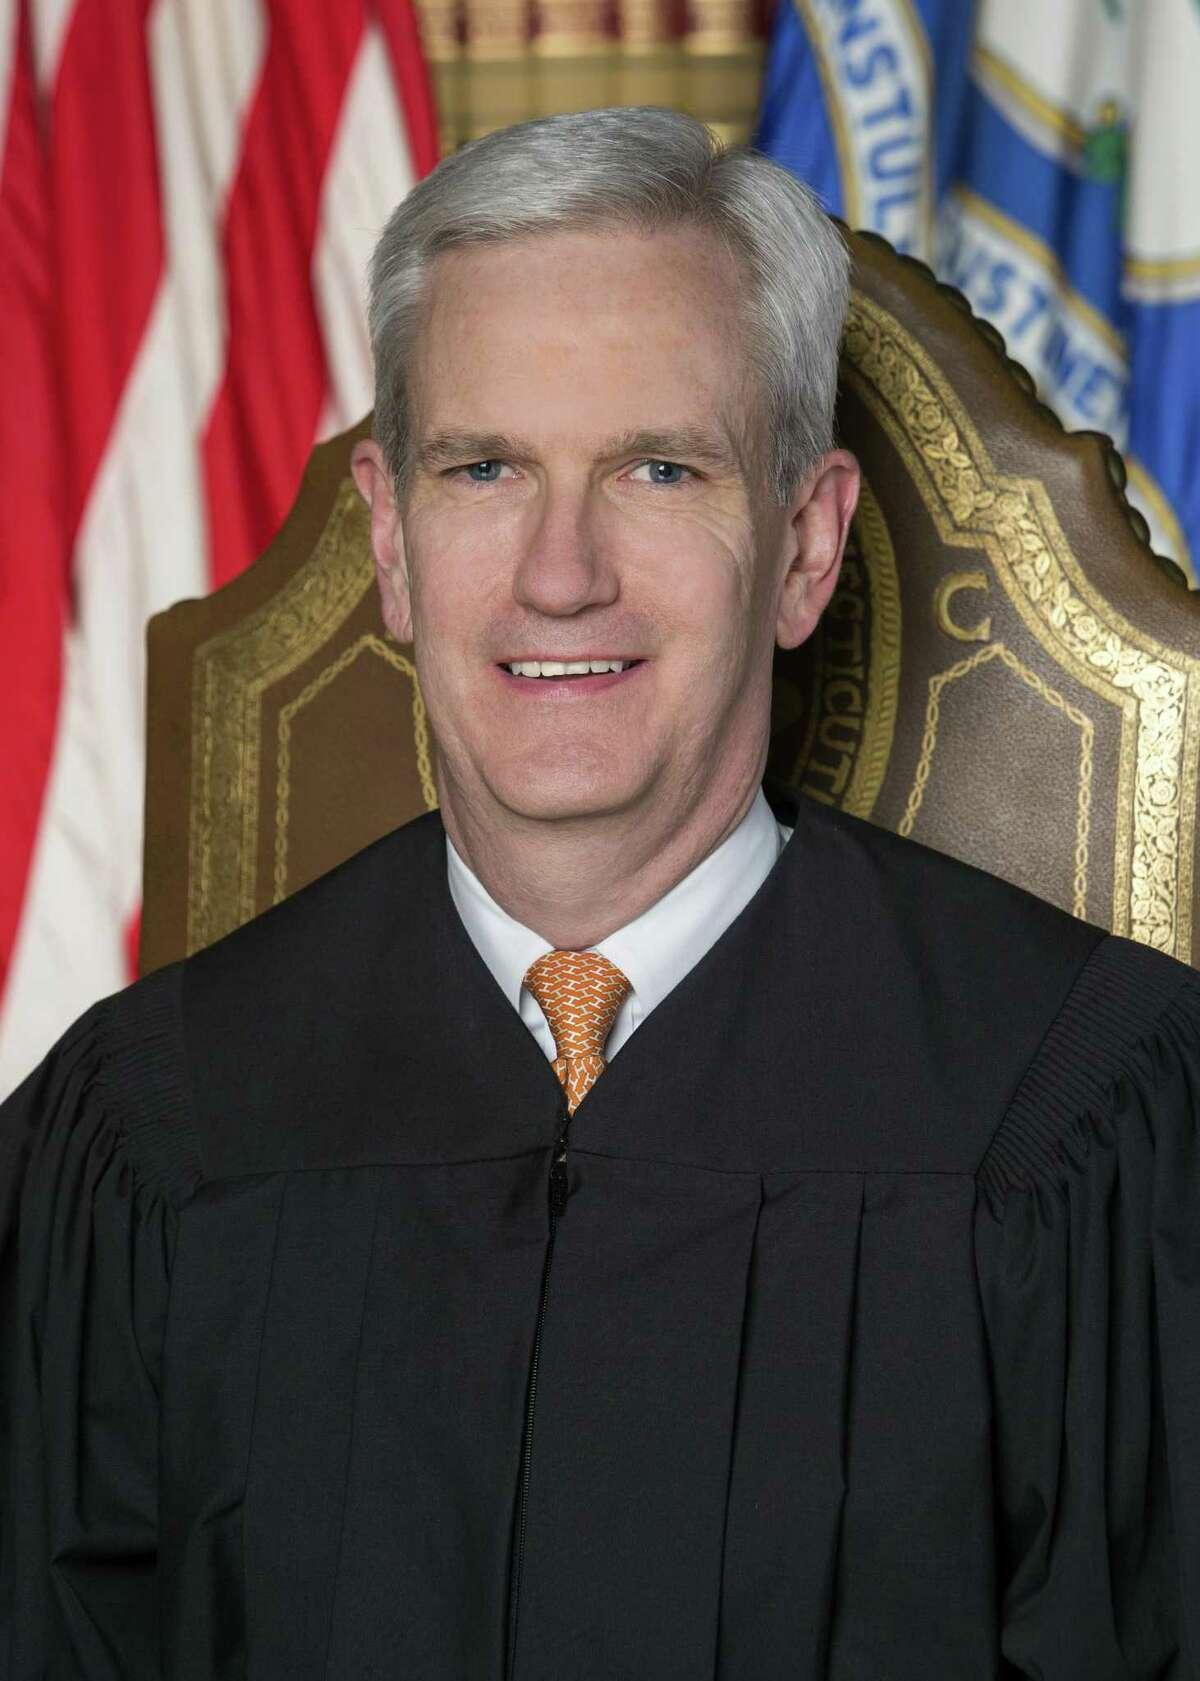 Justice Andrew J. McDonald